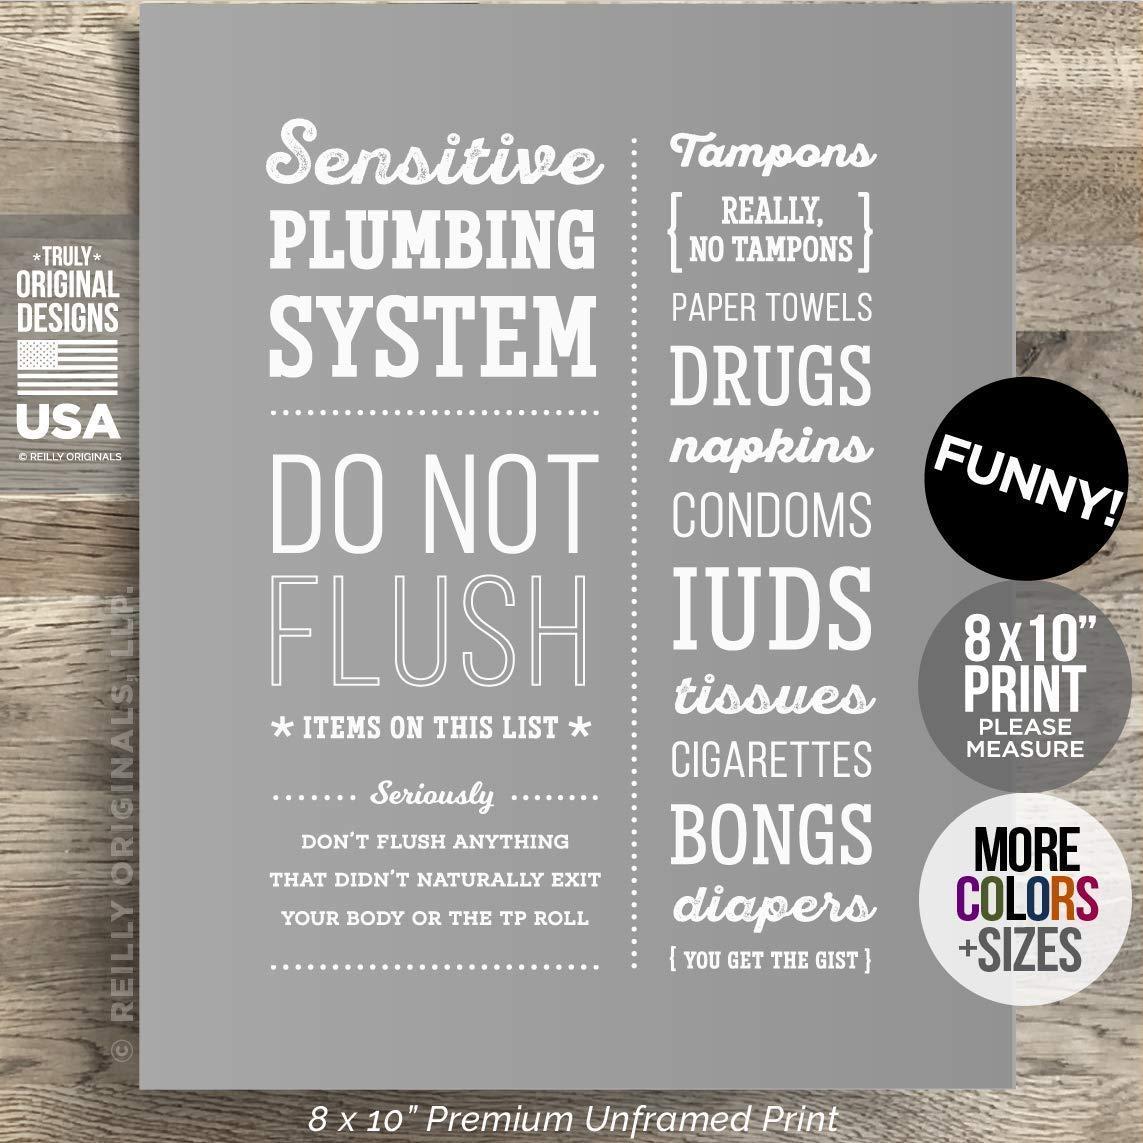 8x10 *UNFRAMED* Funny Bathroom Sign Do Not Flush Sensitive Plumbing Septic System Decor Farmhouse Rustic Home Art Modern Humor No Tampons Feminine Sanitary Product Paper Toilet Drugs Bongs IUD Condom